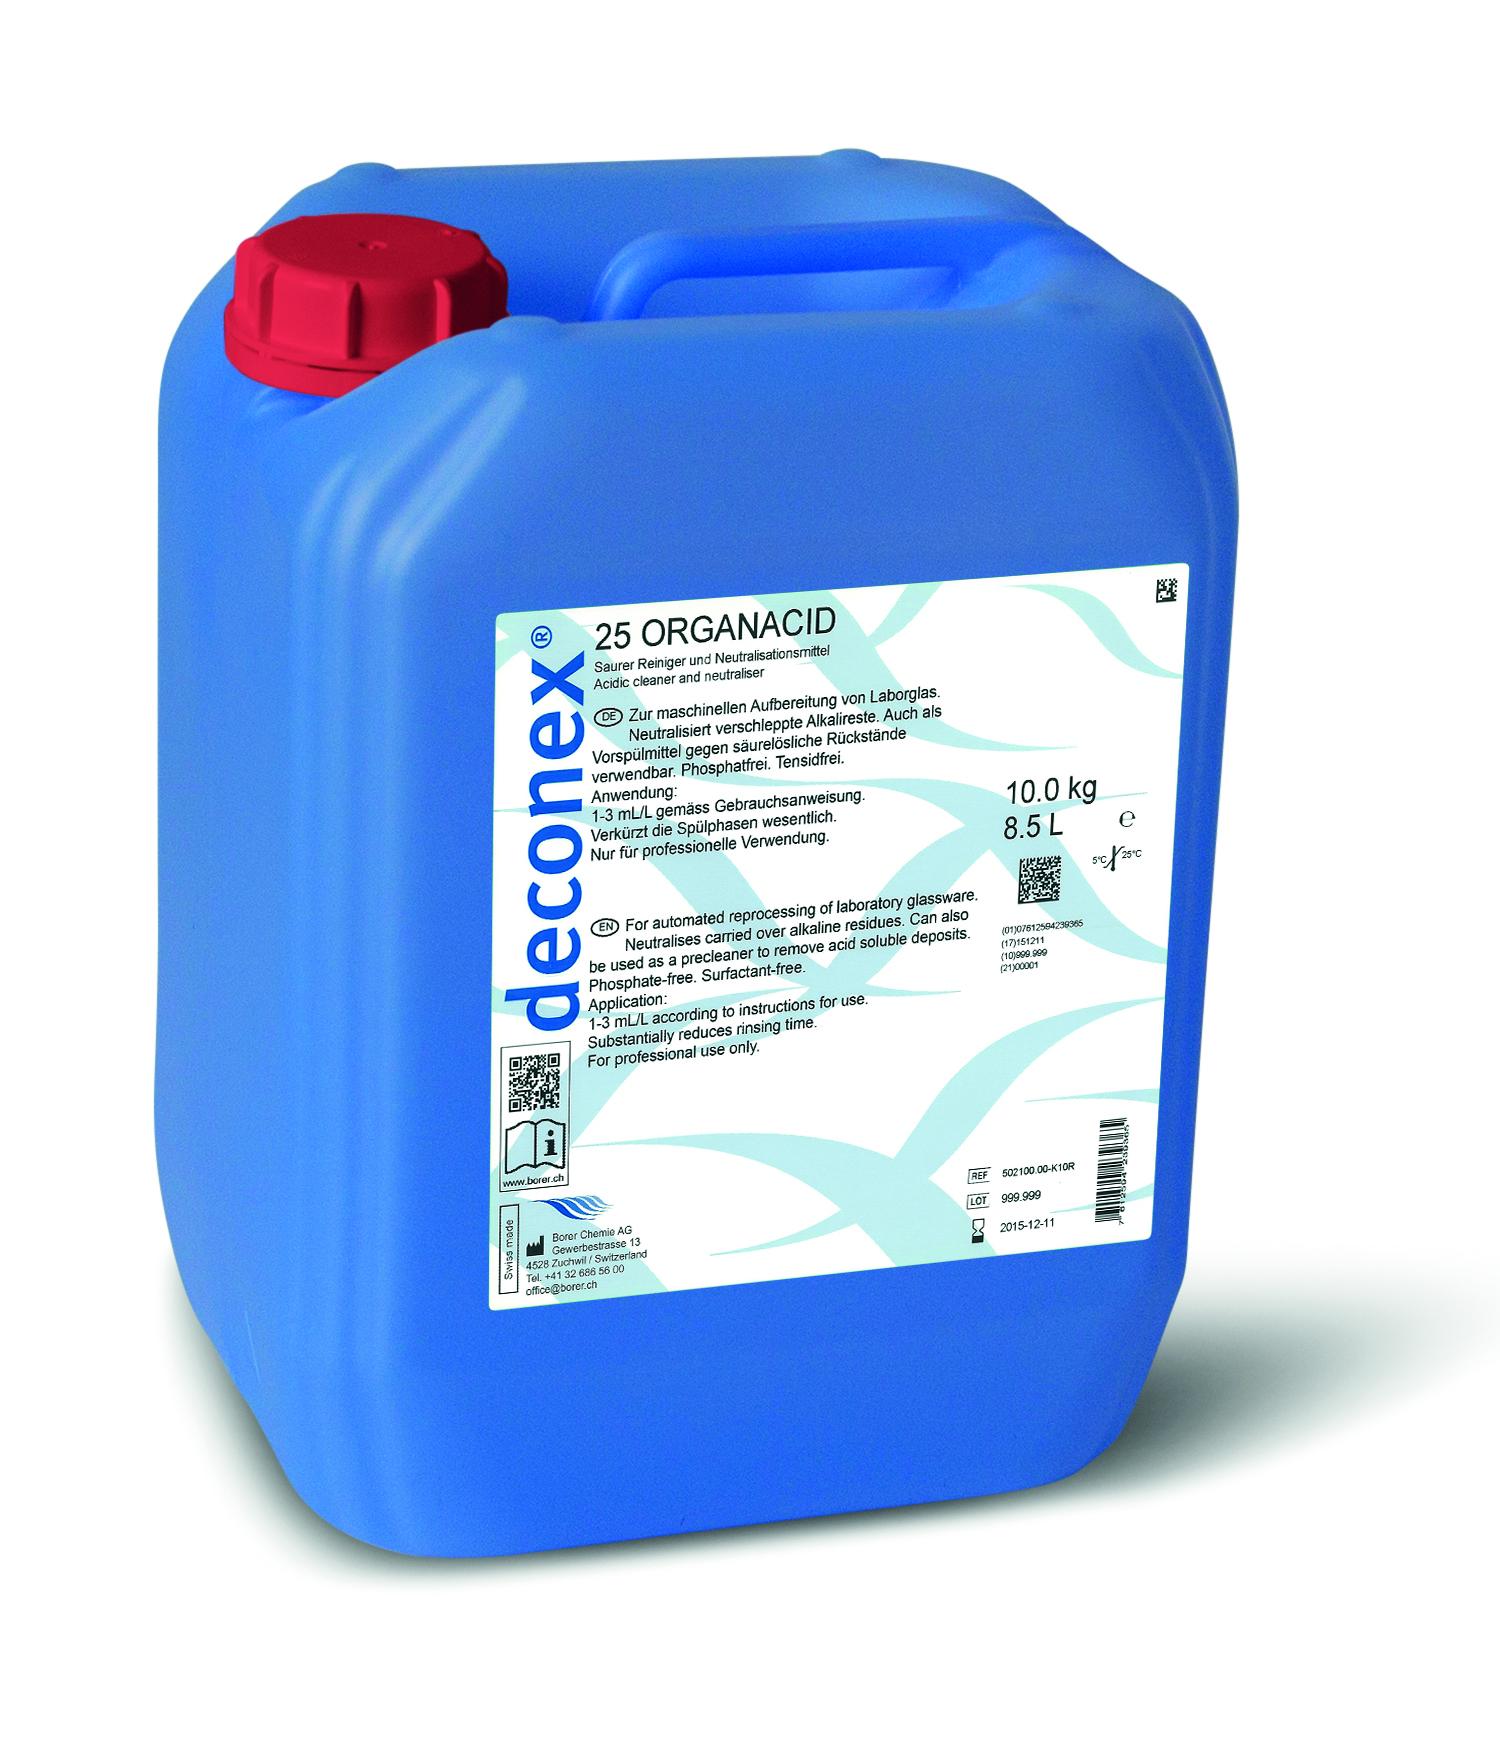 deconex® 25 ORGANACID neutralisator, vloeibaar (63050551.9010)